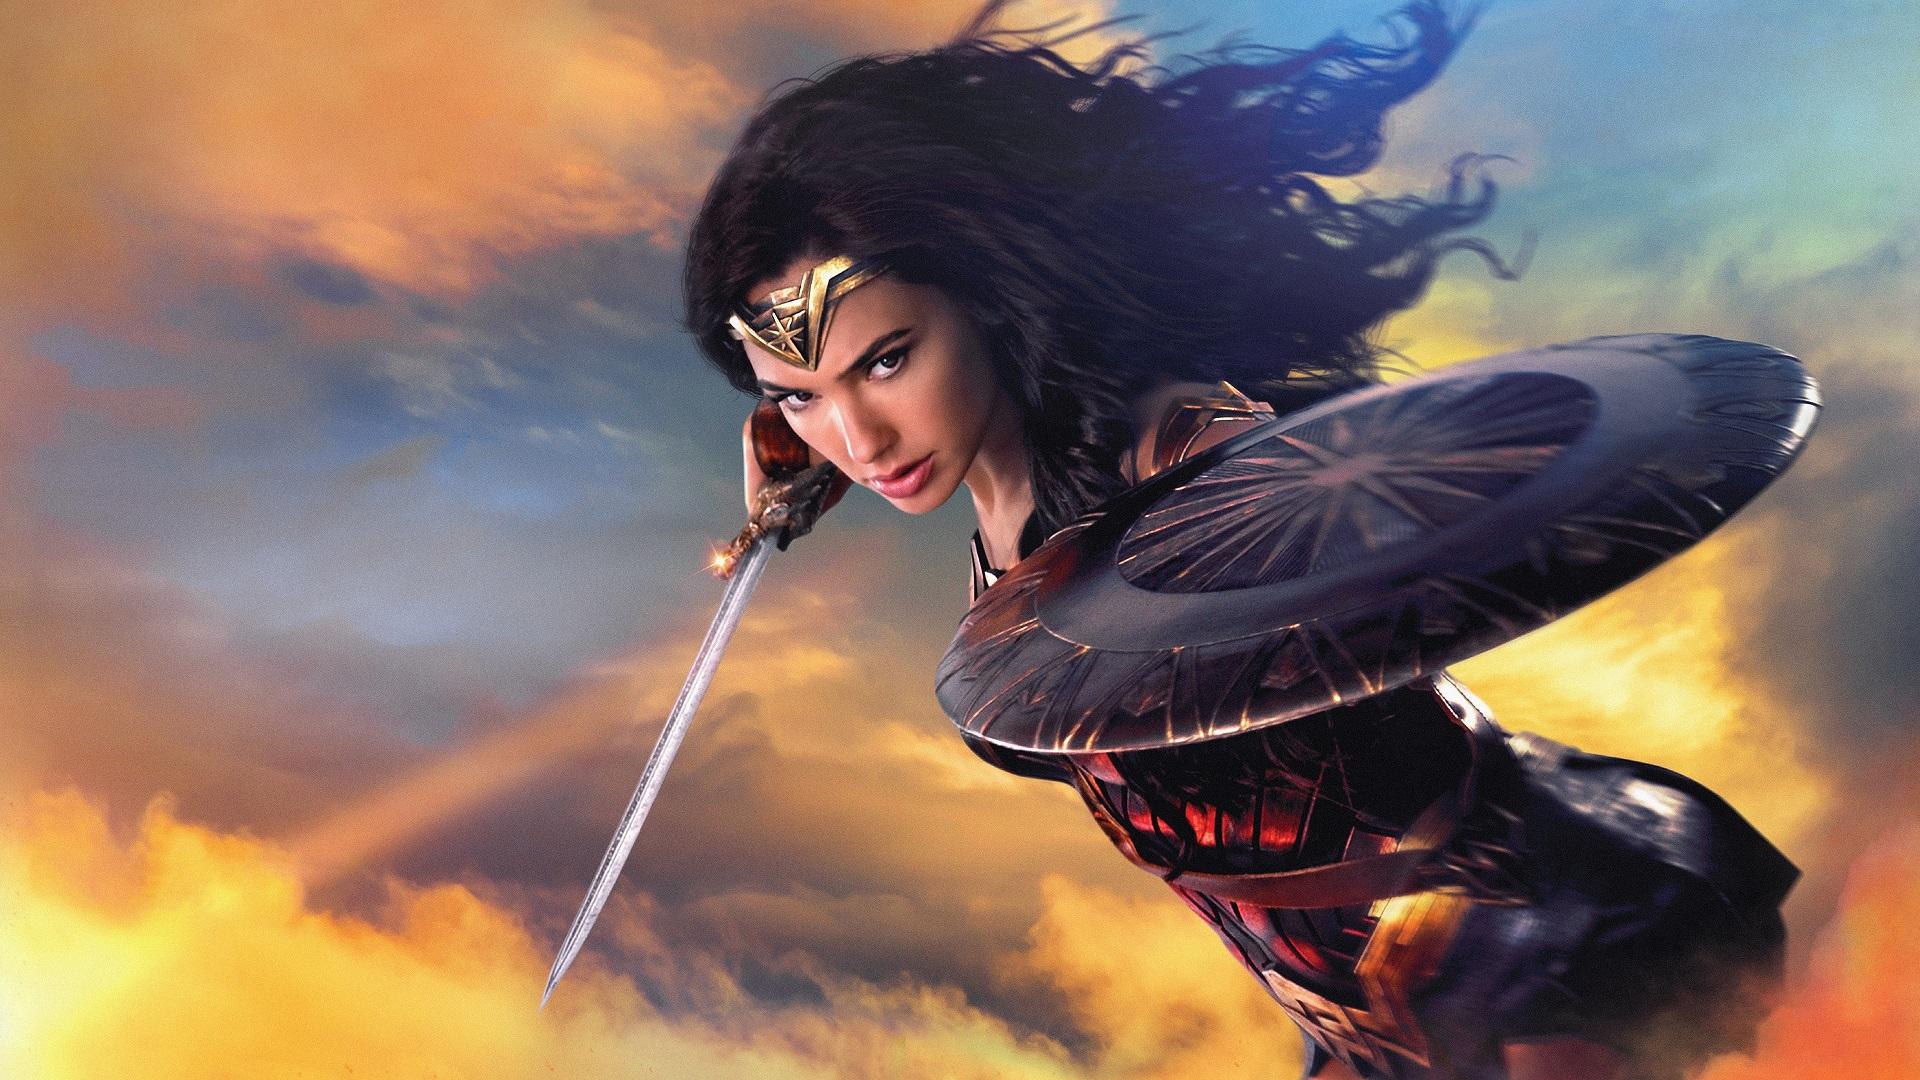 People 1920x1080 Wonder Woman DC Comics Gal Gadot sword shield women